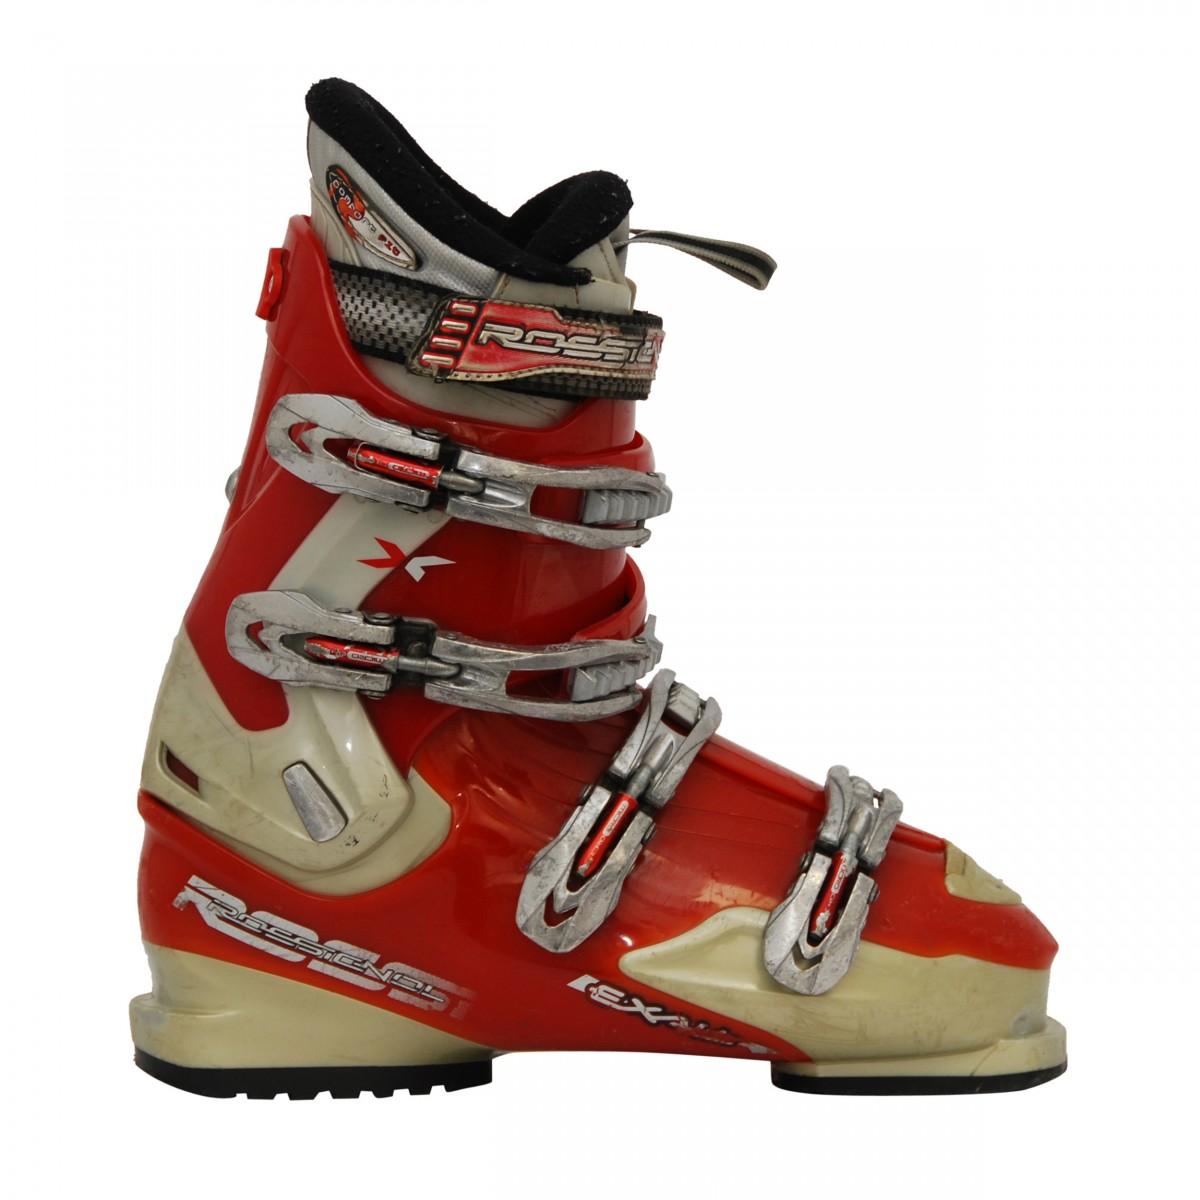 Chaussures skis rossignol occasion en Rhône Alpes , annonces